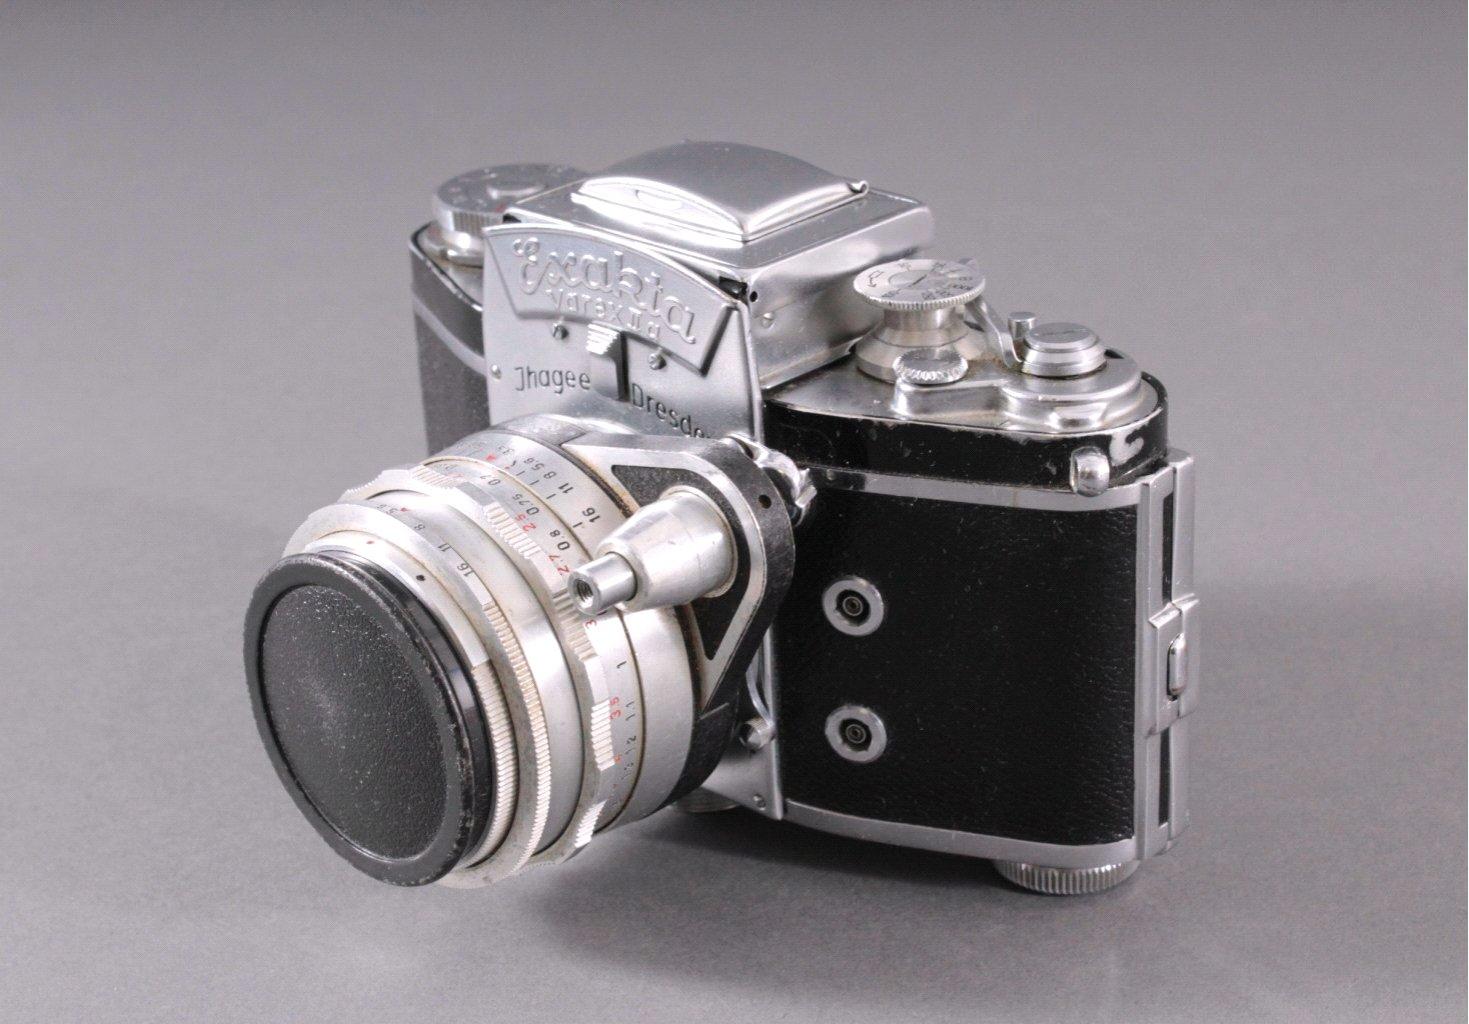 Spiegelreflex-Kamera Exakta Varex IIa. 24x36mm. 1958-2